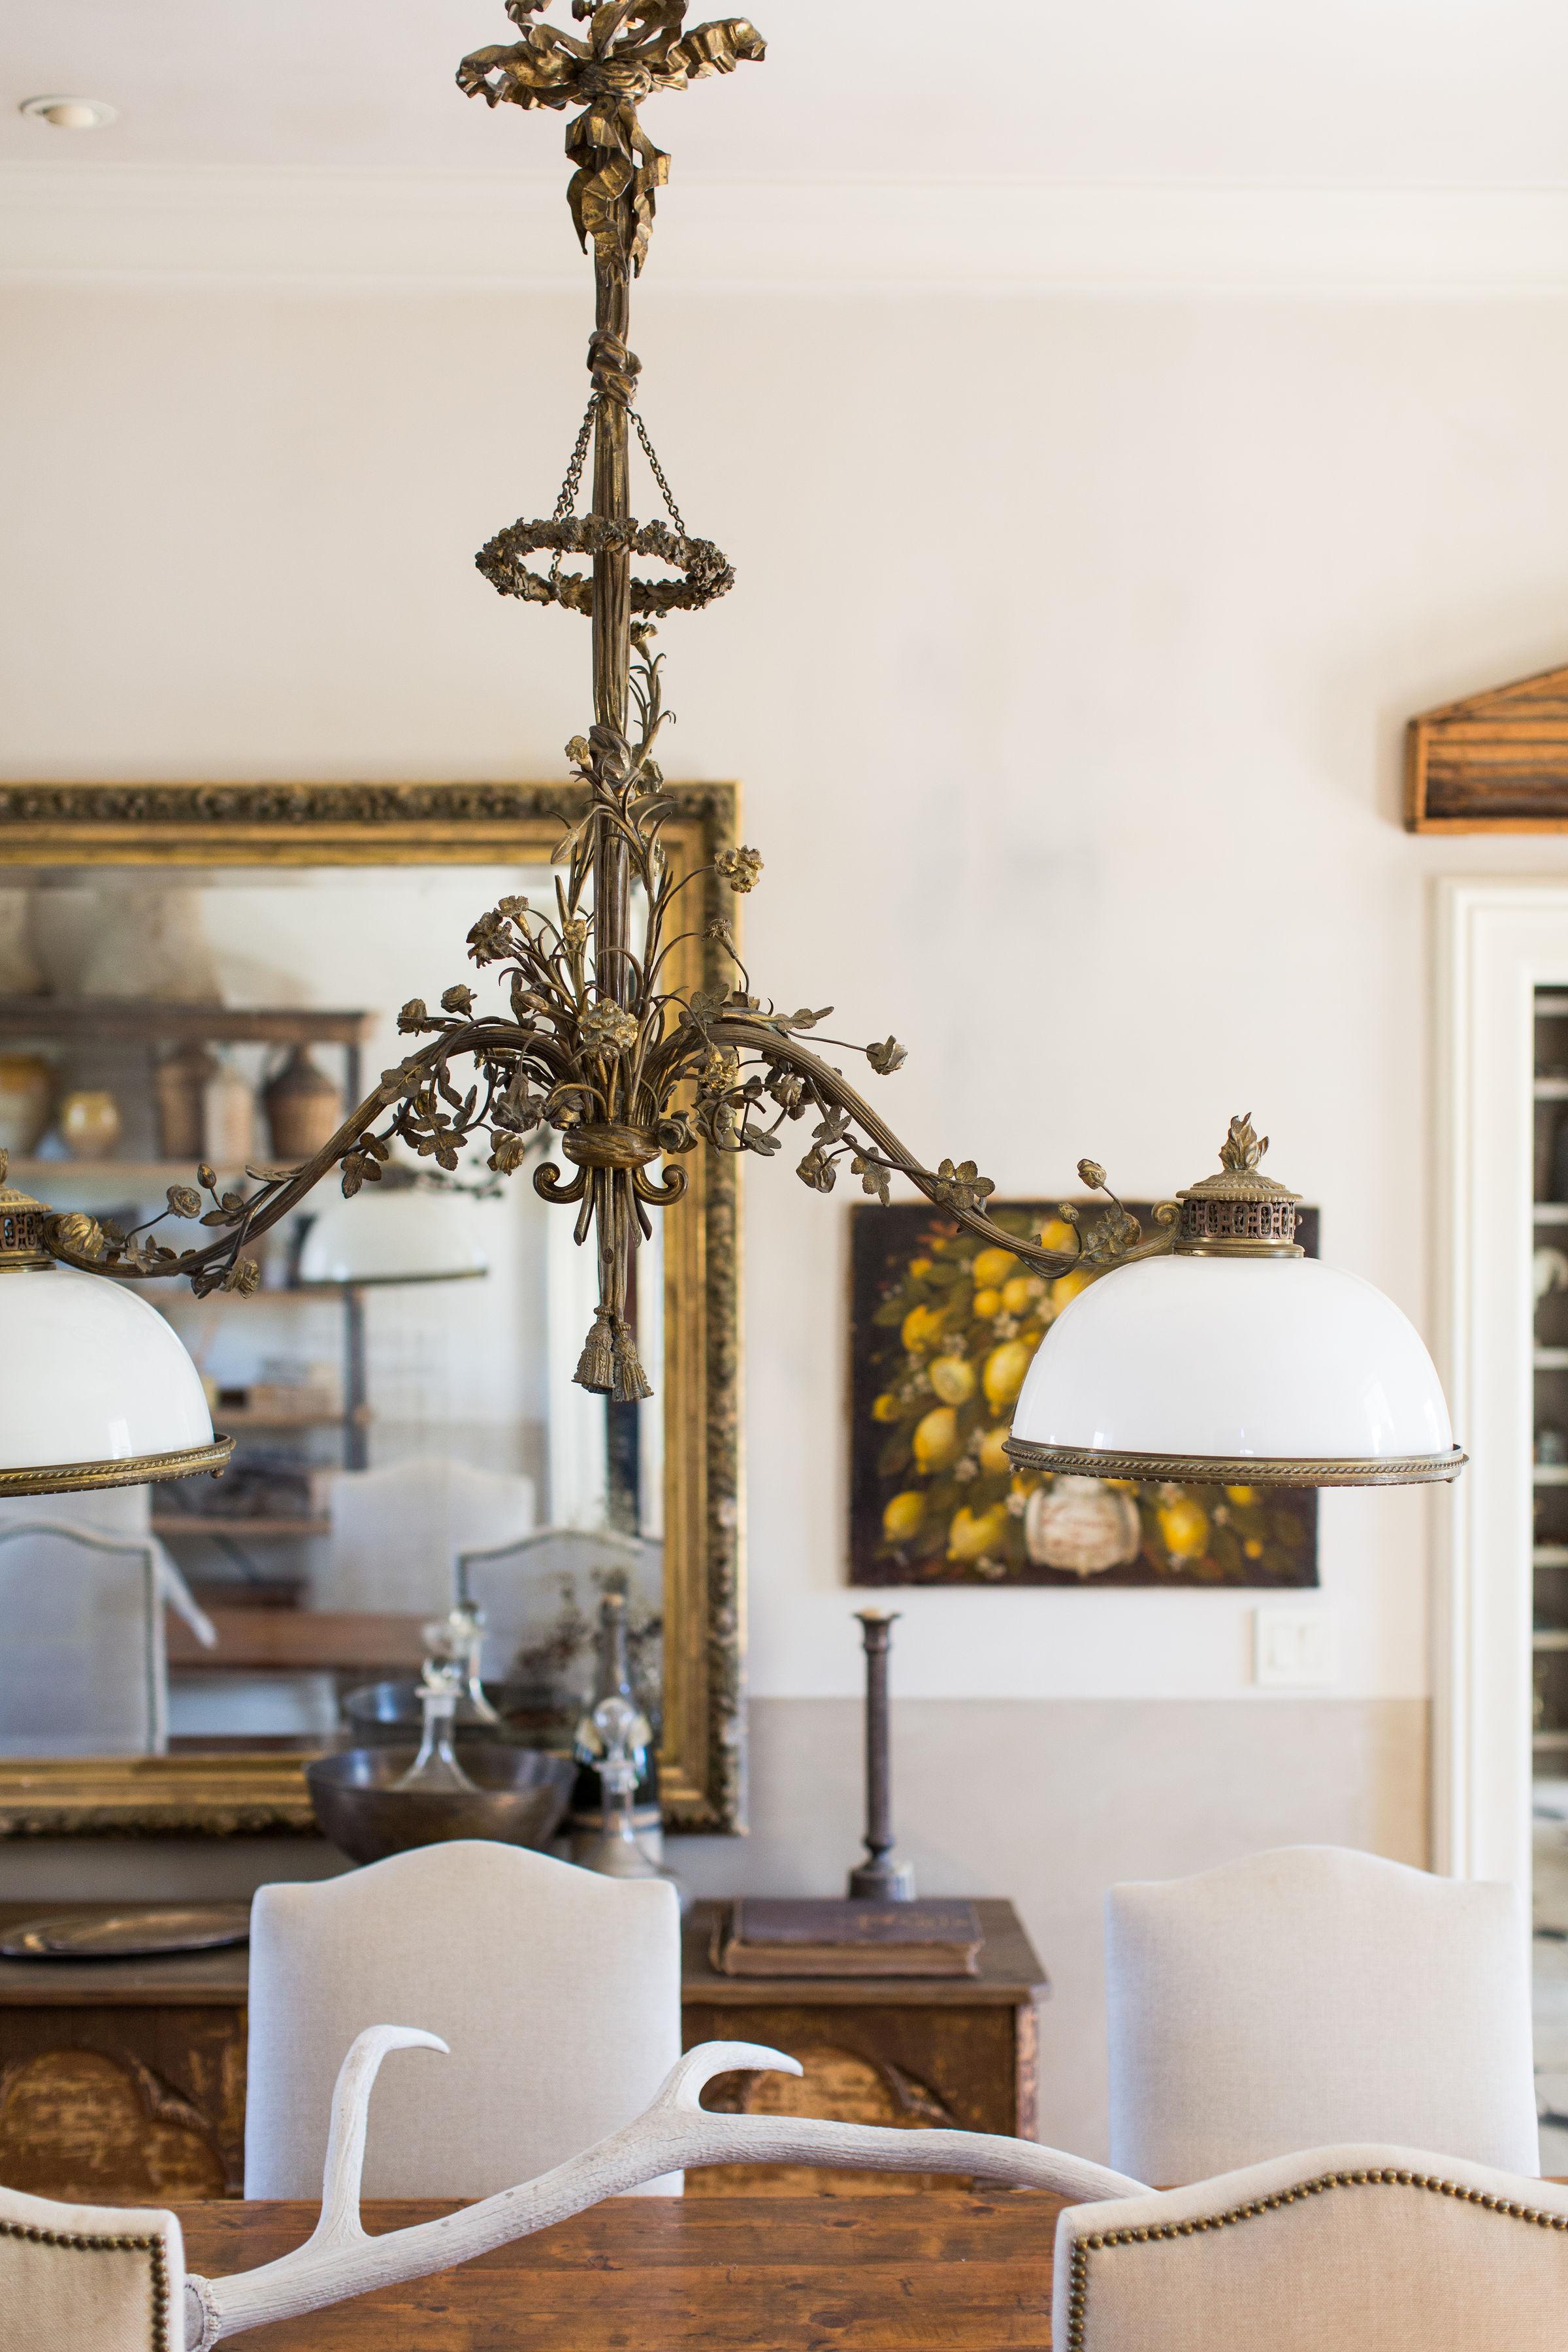 French vintage chandelier and objet d'art